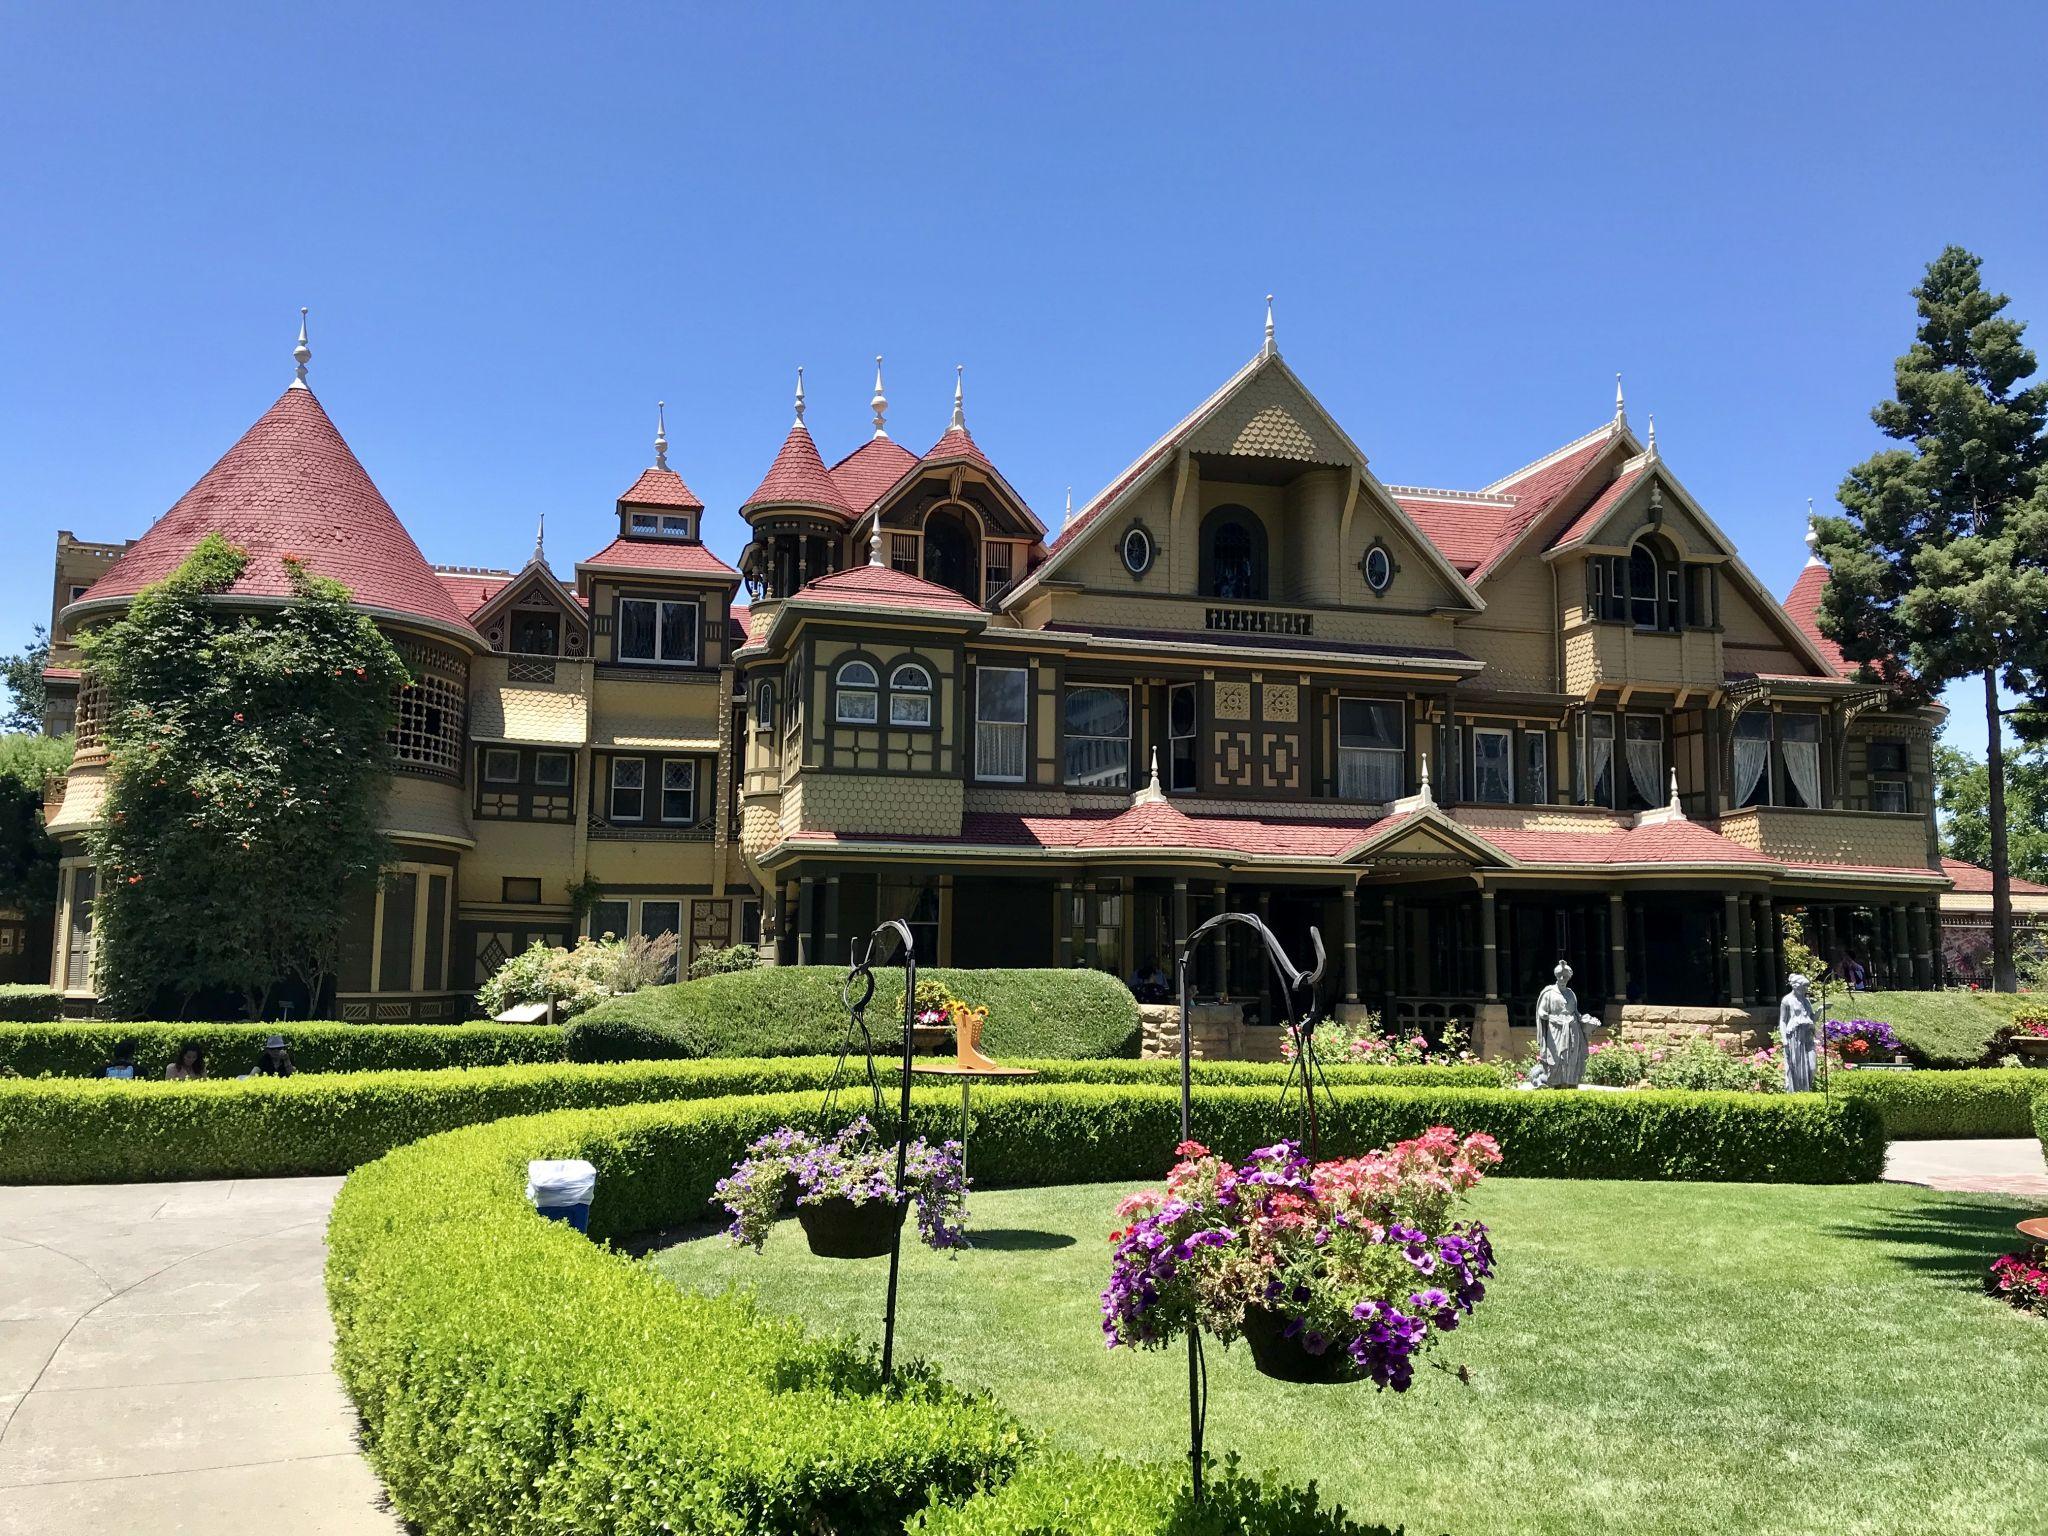 Winchester mystery house, California, USA